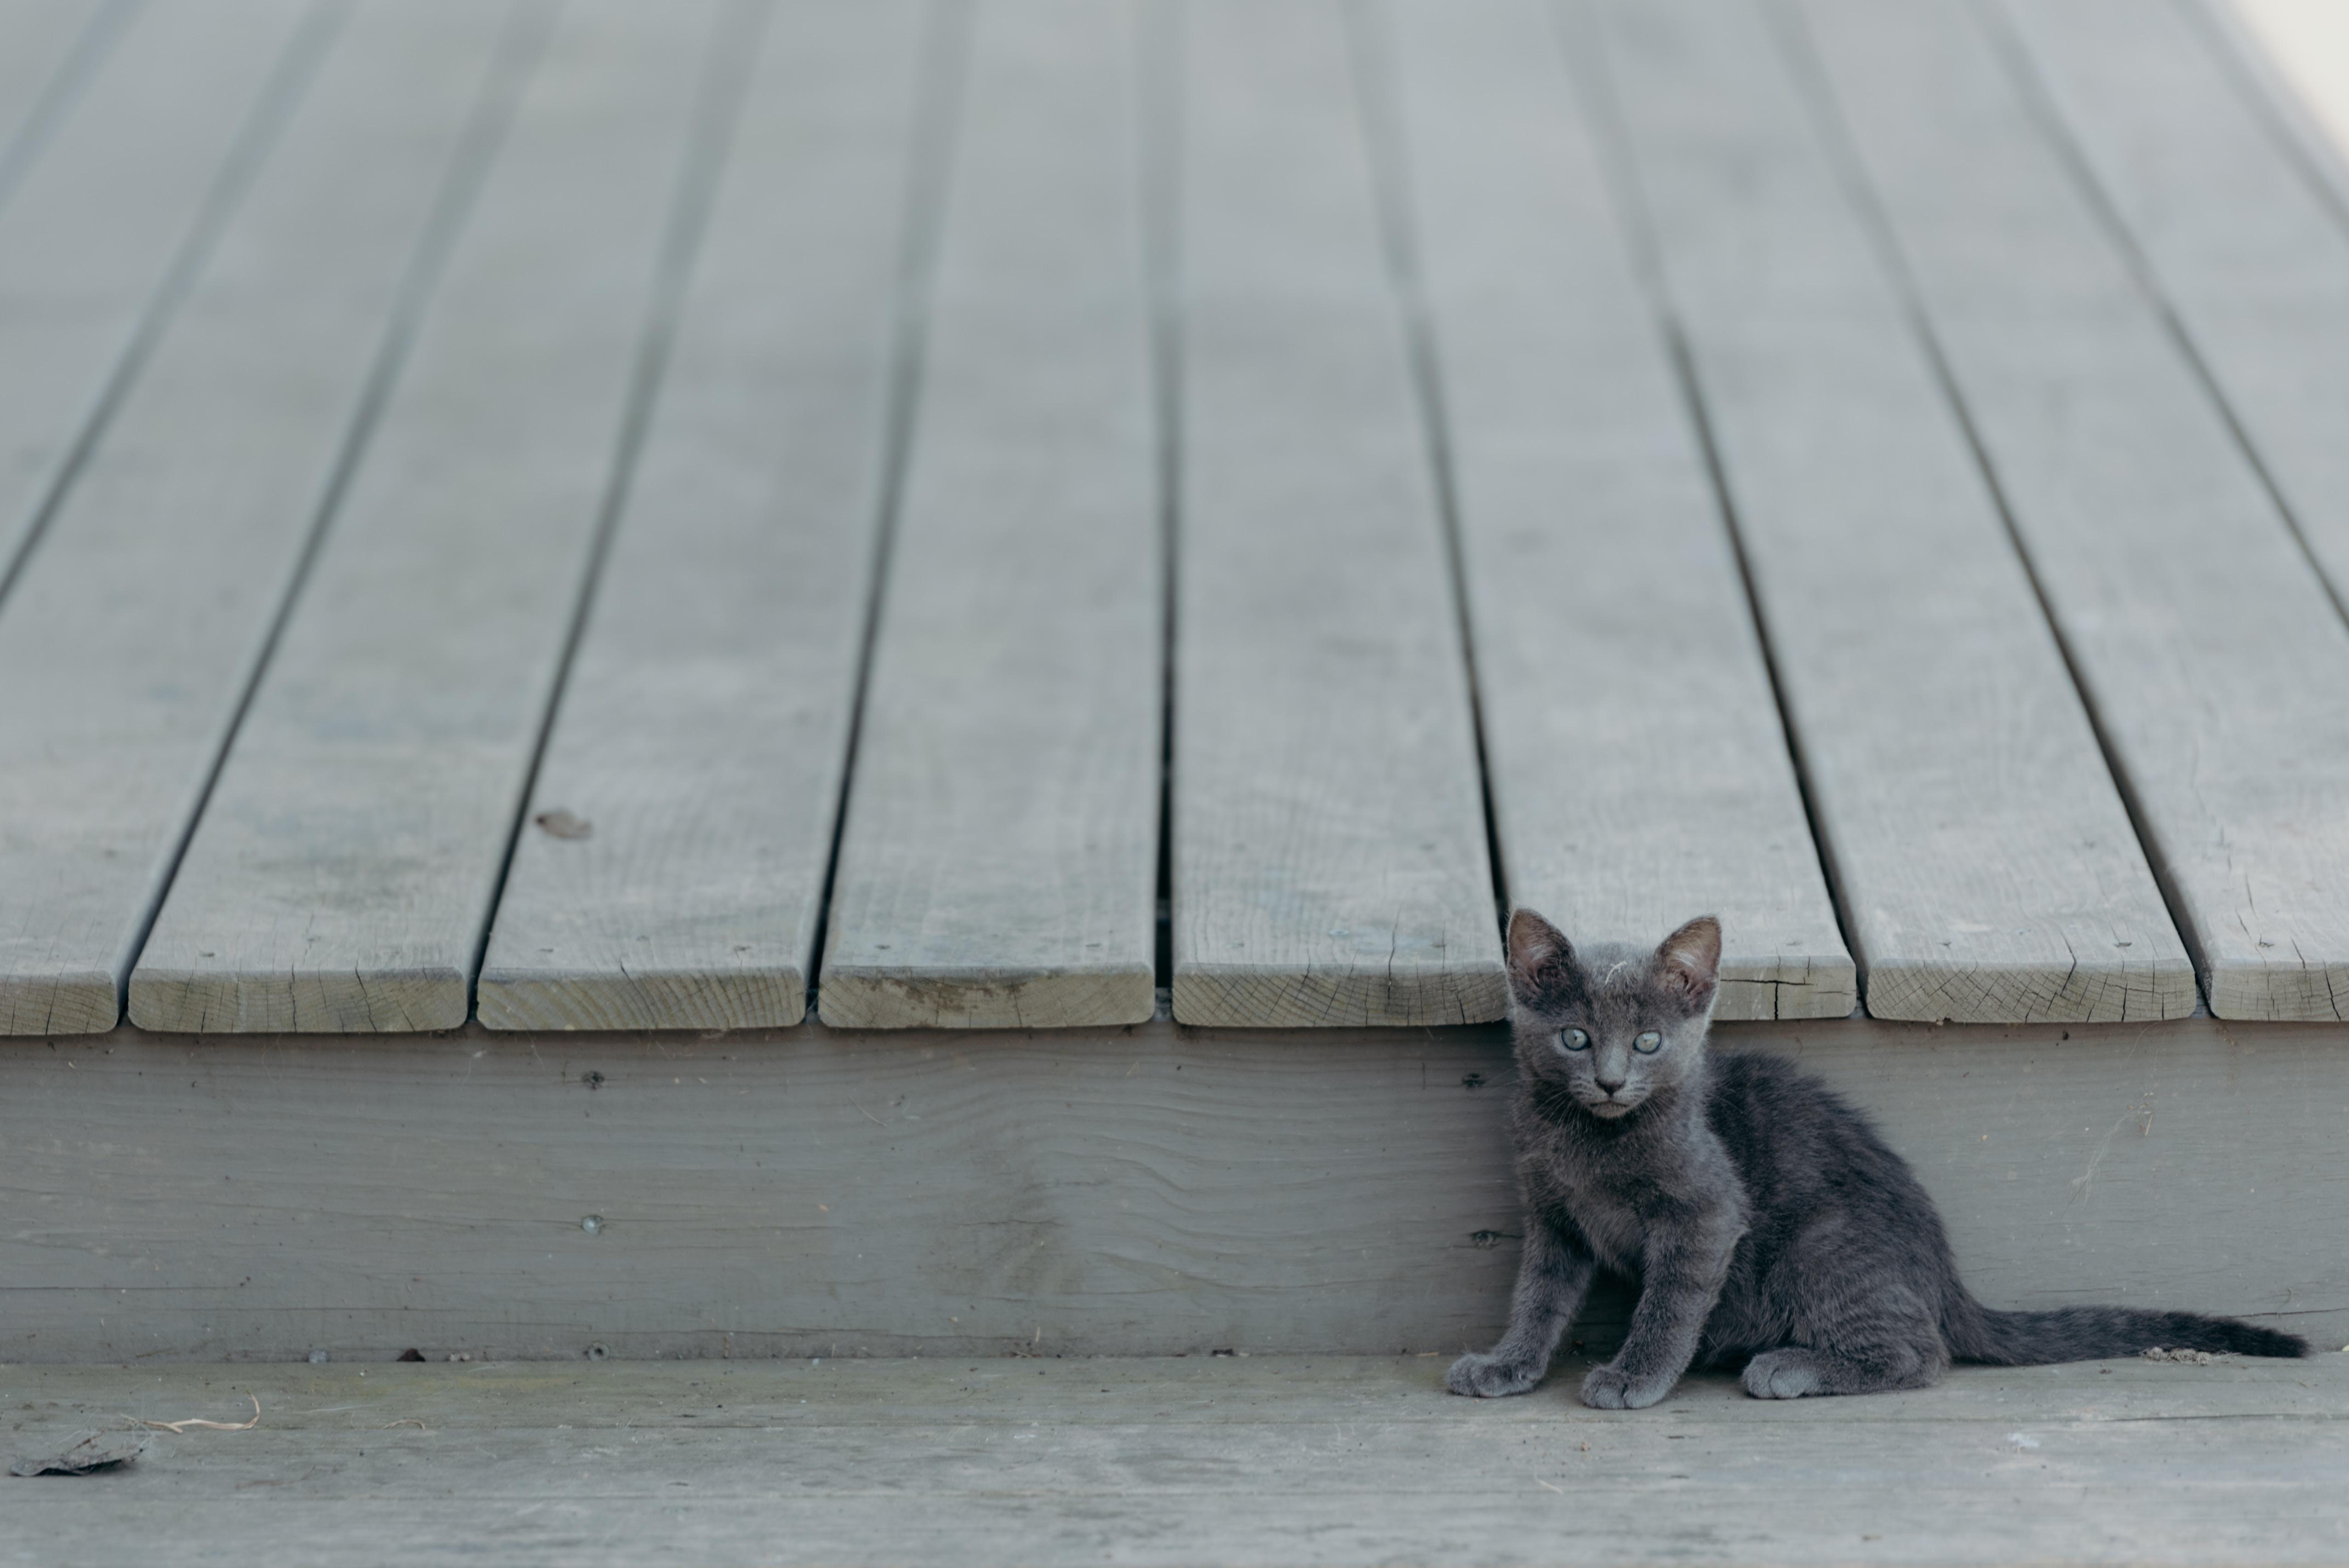 Gray kitten looking startled beside a wooden deck